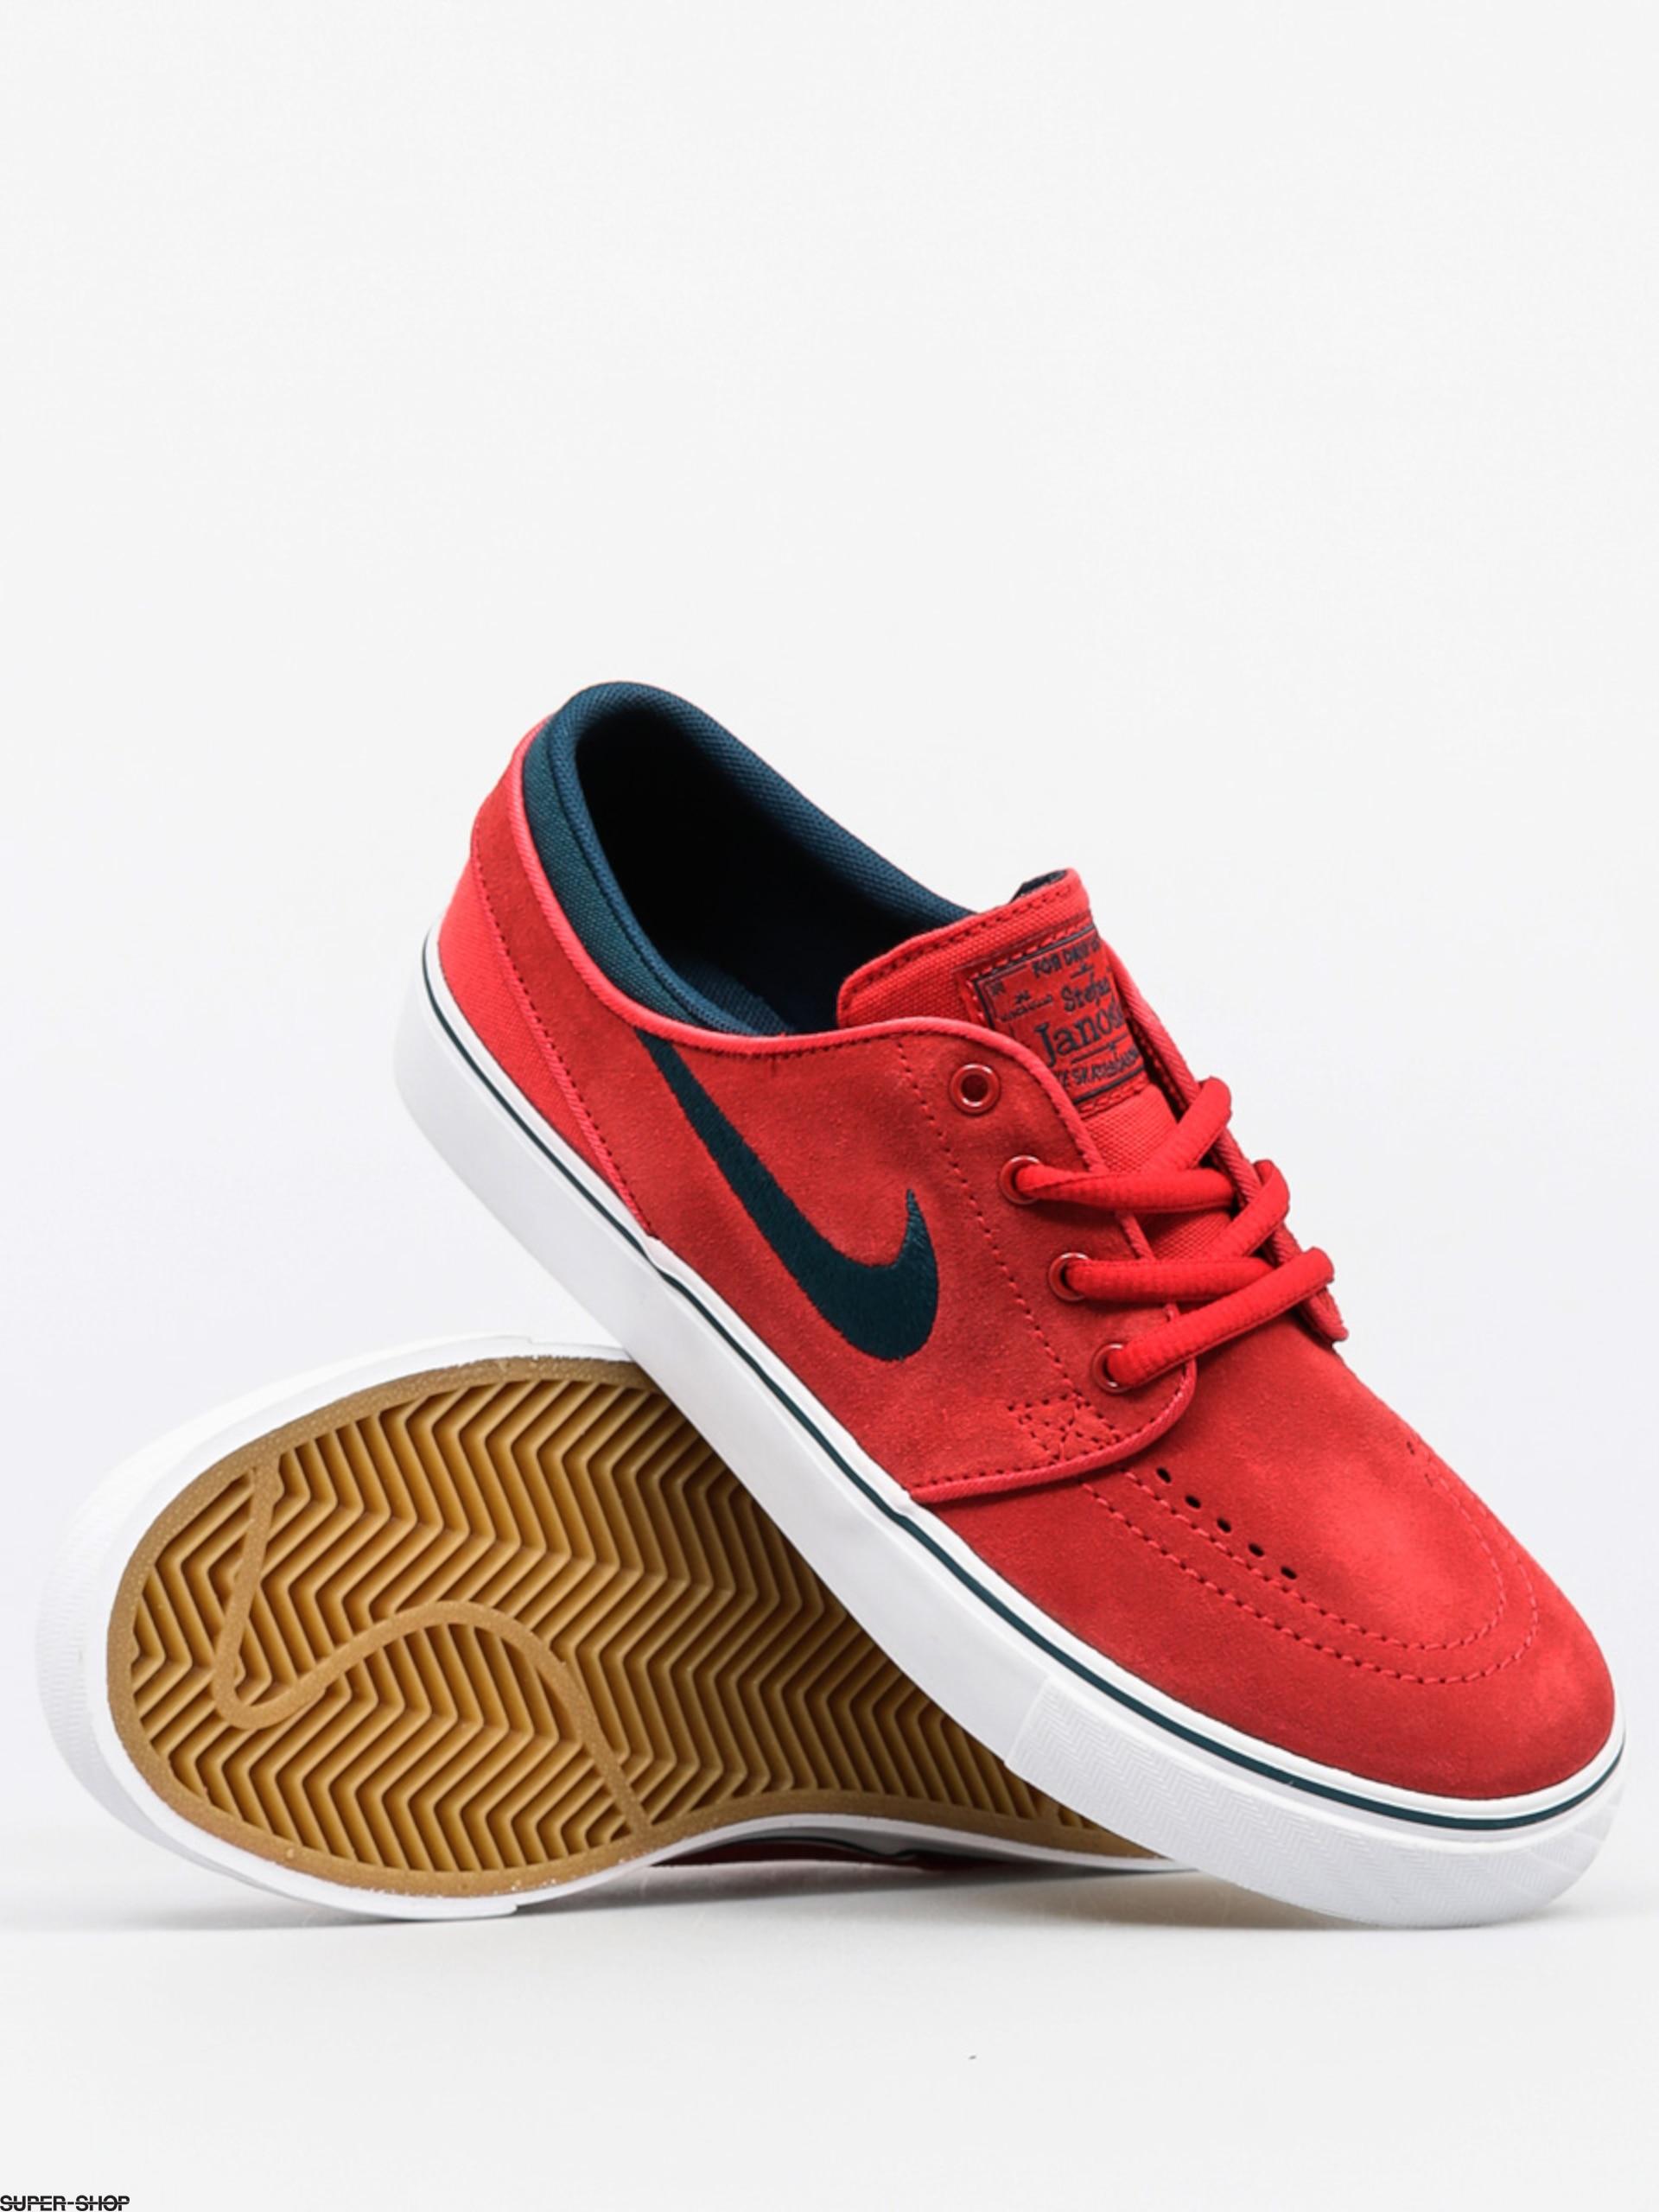 newest 957bb 447e4 Nike SB Kinderschuhe Stefan Janoski Gs (unvrsty rdmdnght trq